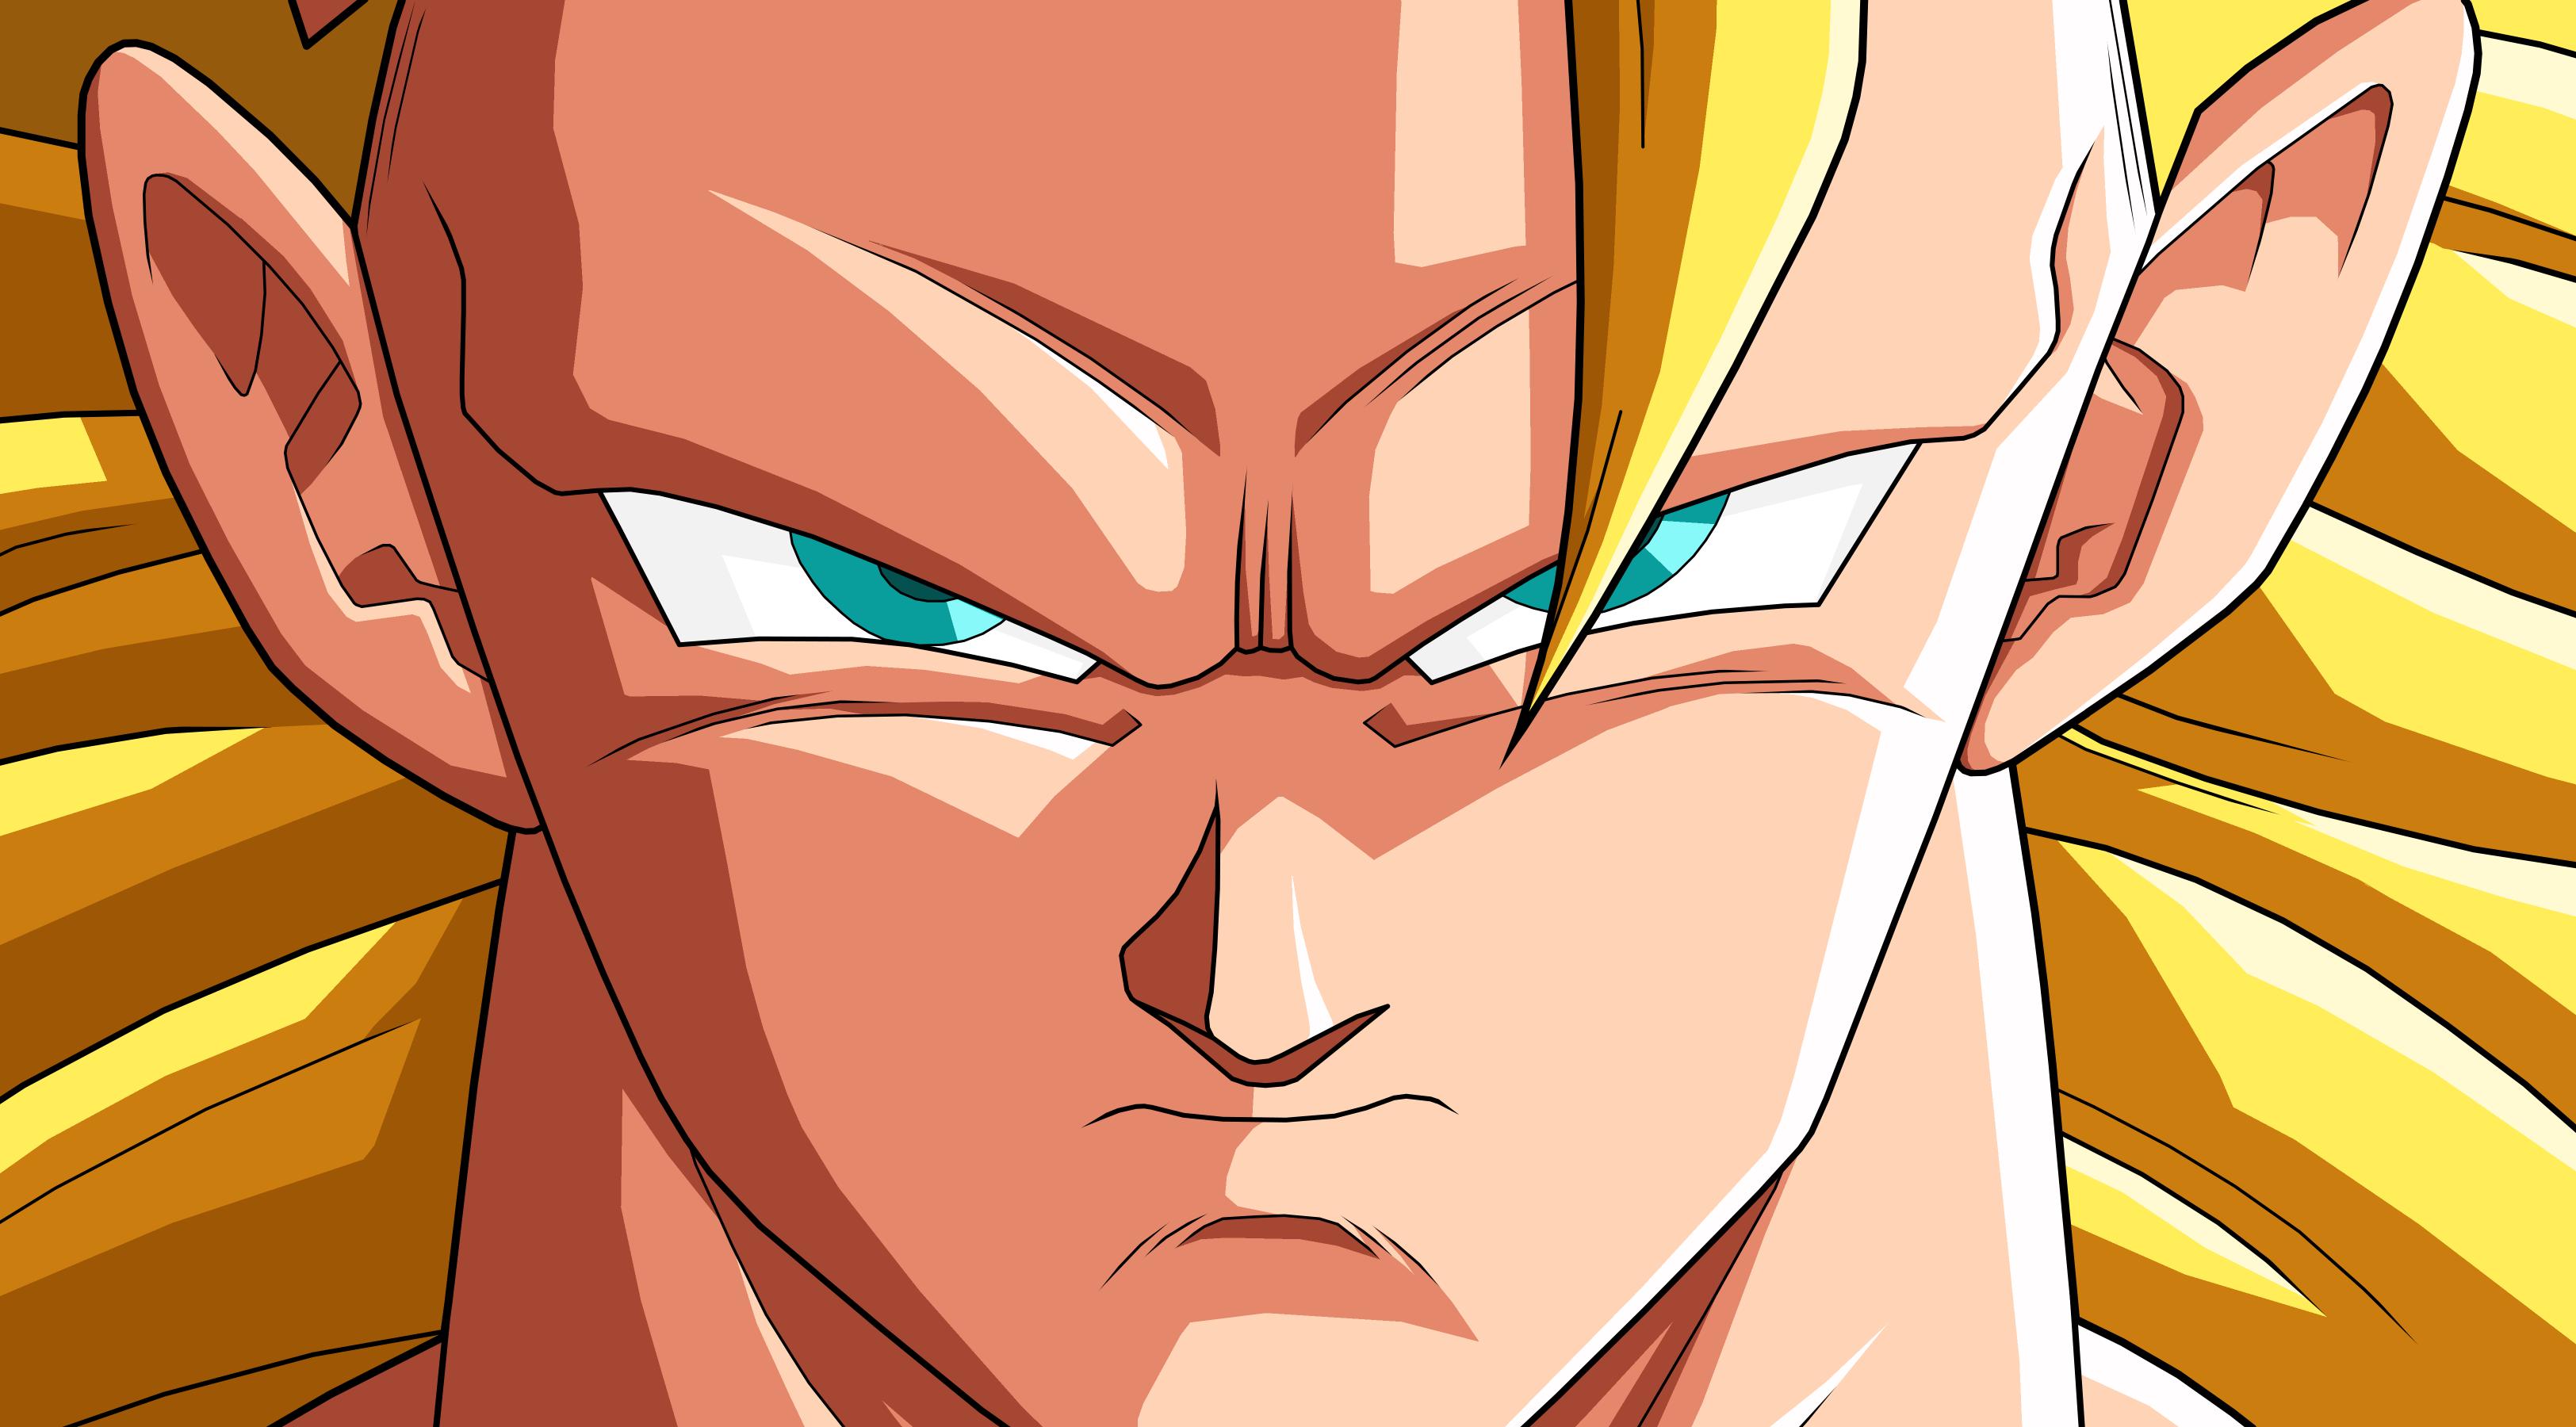 Goku ssj3 full hd papel de parede and background image - Papier peint dragon ball z ...